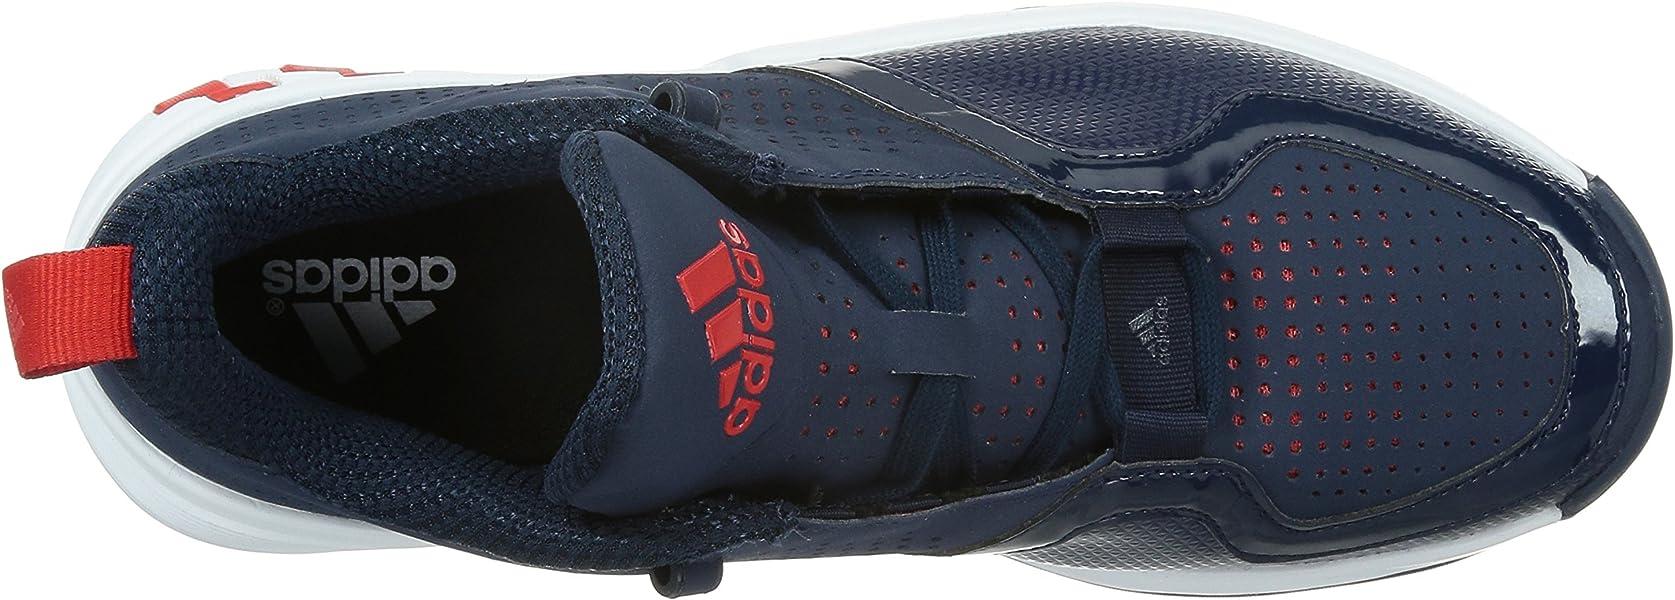 Adidas ConavyscarleftwwhtGröße Up 2 5 Post Adidas 8 A5RjL4